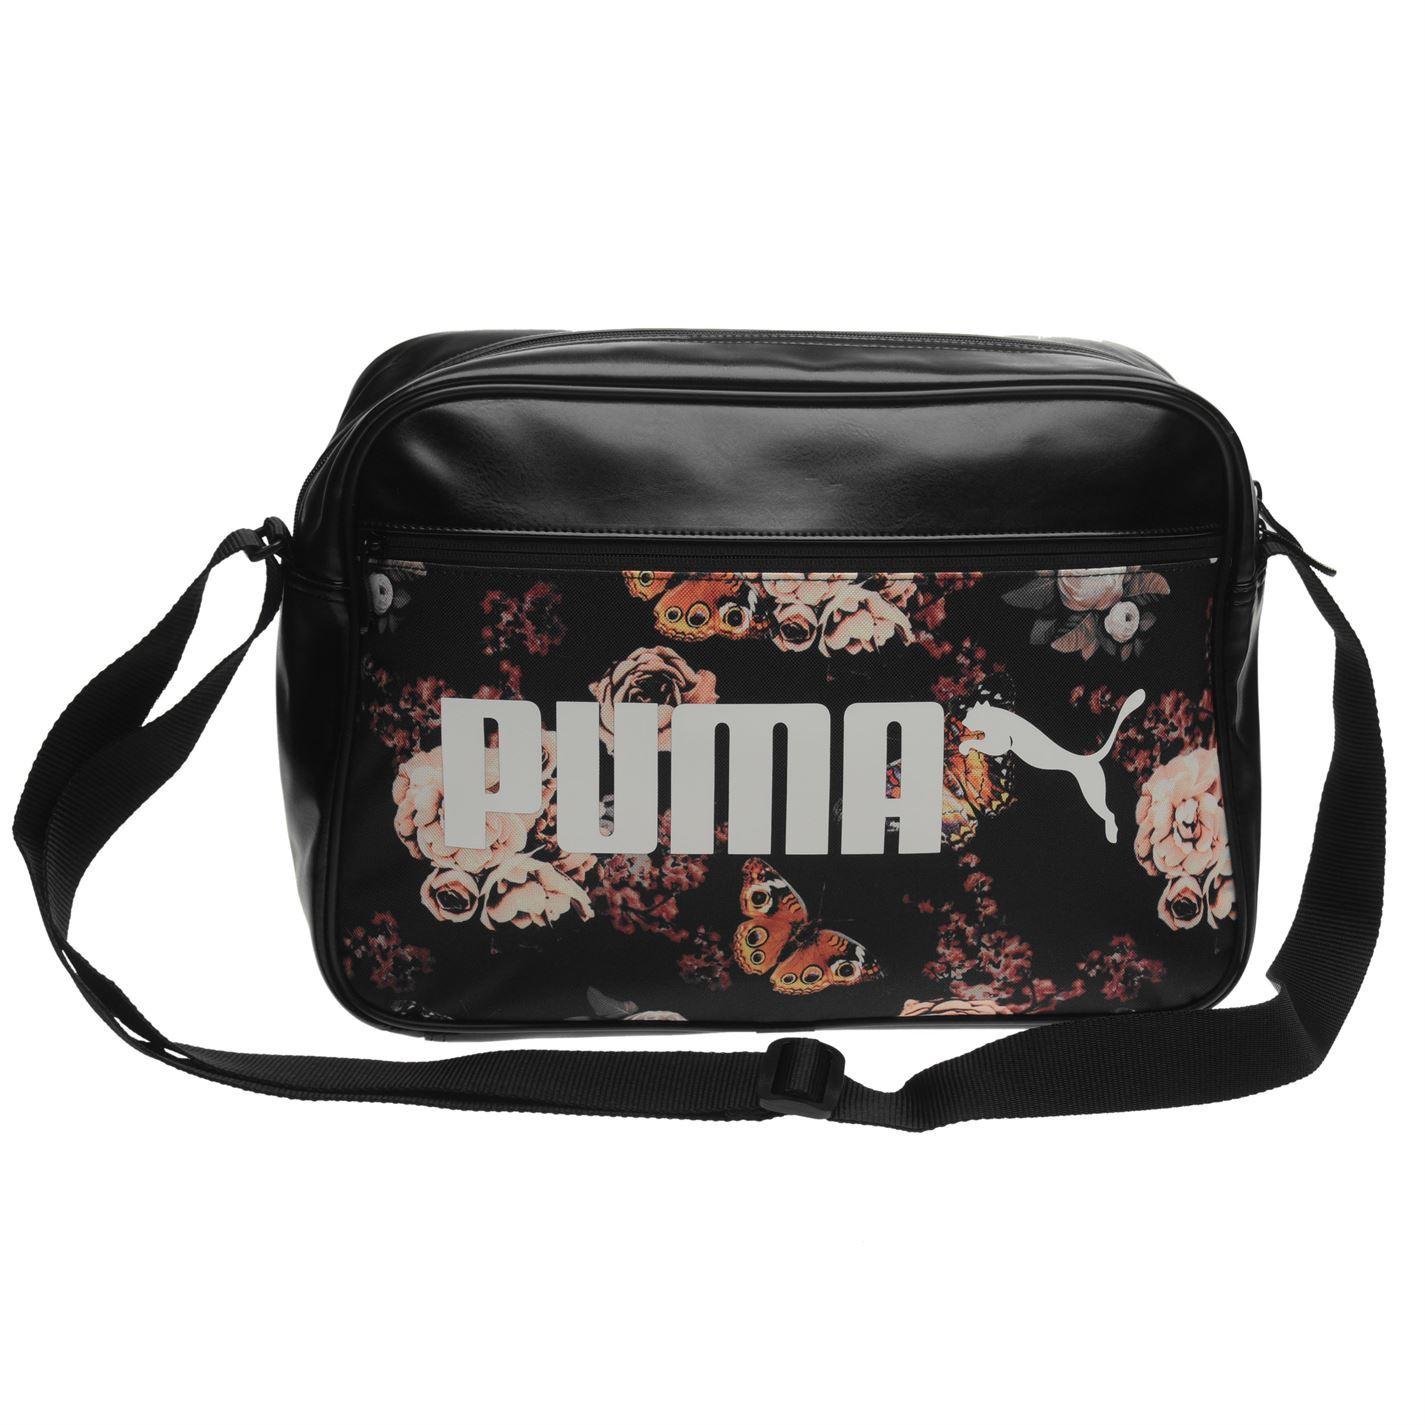 37dc385b25 ... Puma Flower Campus Reporter Bag Black Messenger Flight Bag Holdall ...